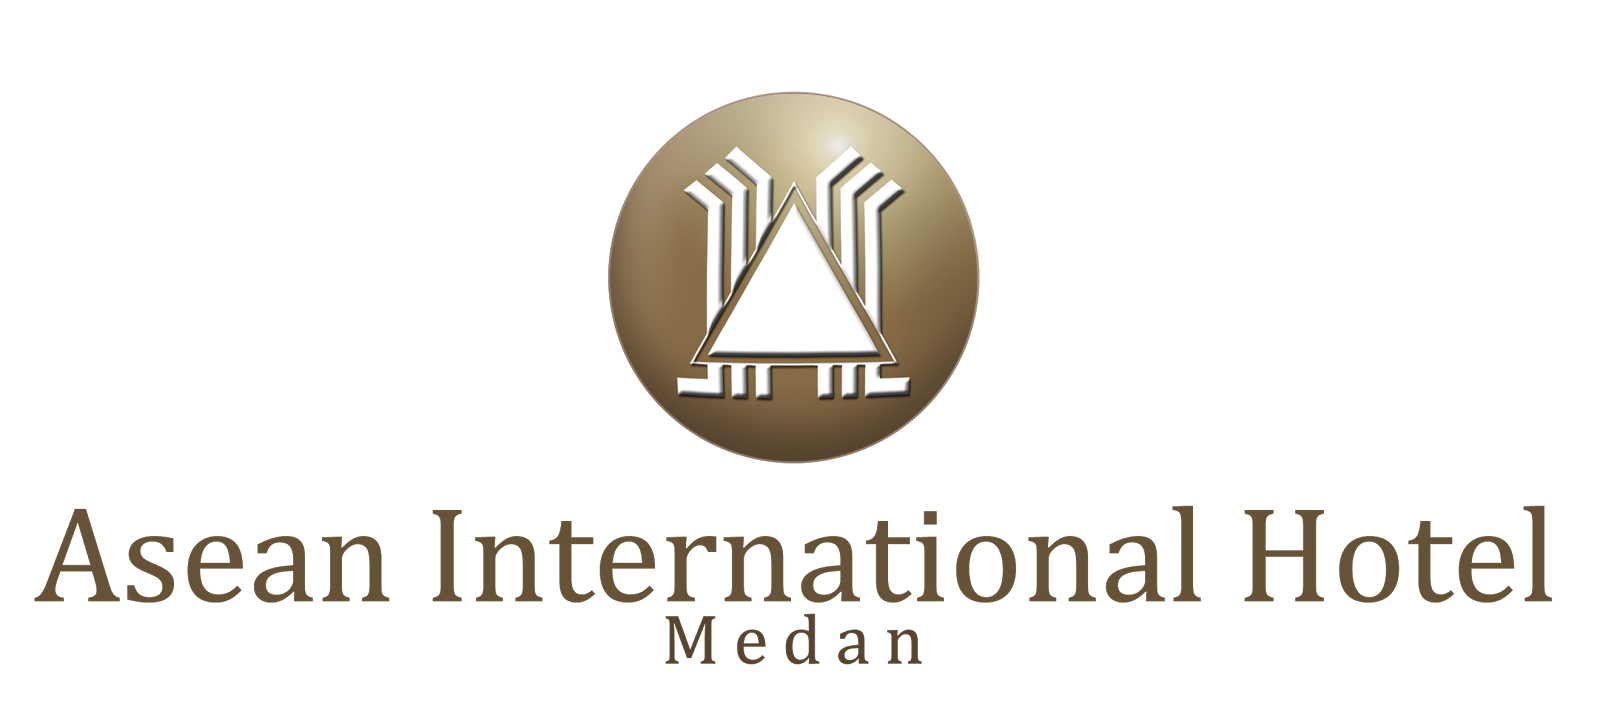 Asean International Hotel Medan